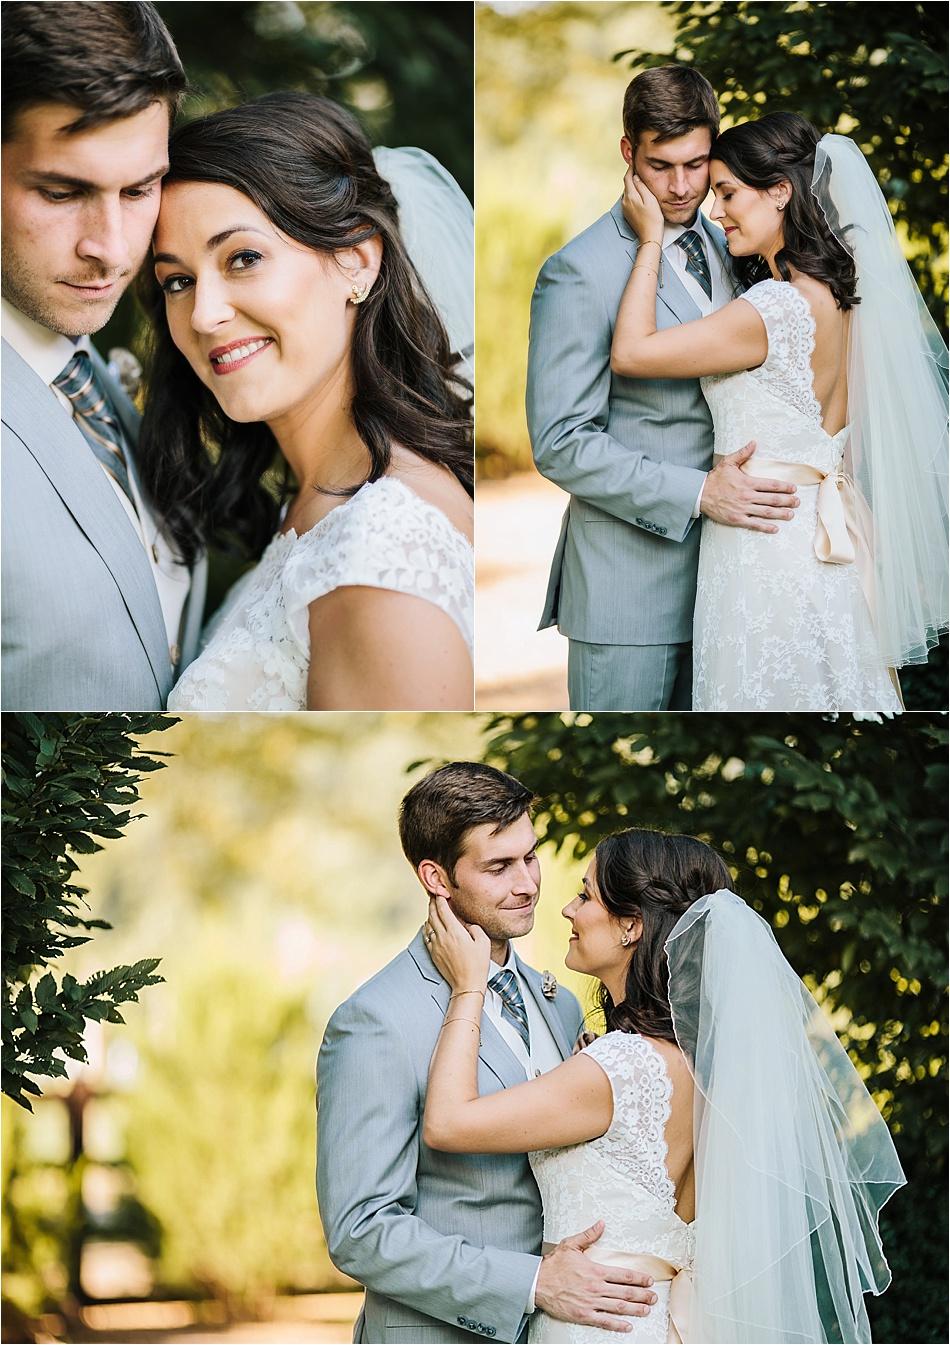 CK-Photo-Nashville-wedding-photographer-Long-Hollow-Gardens